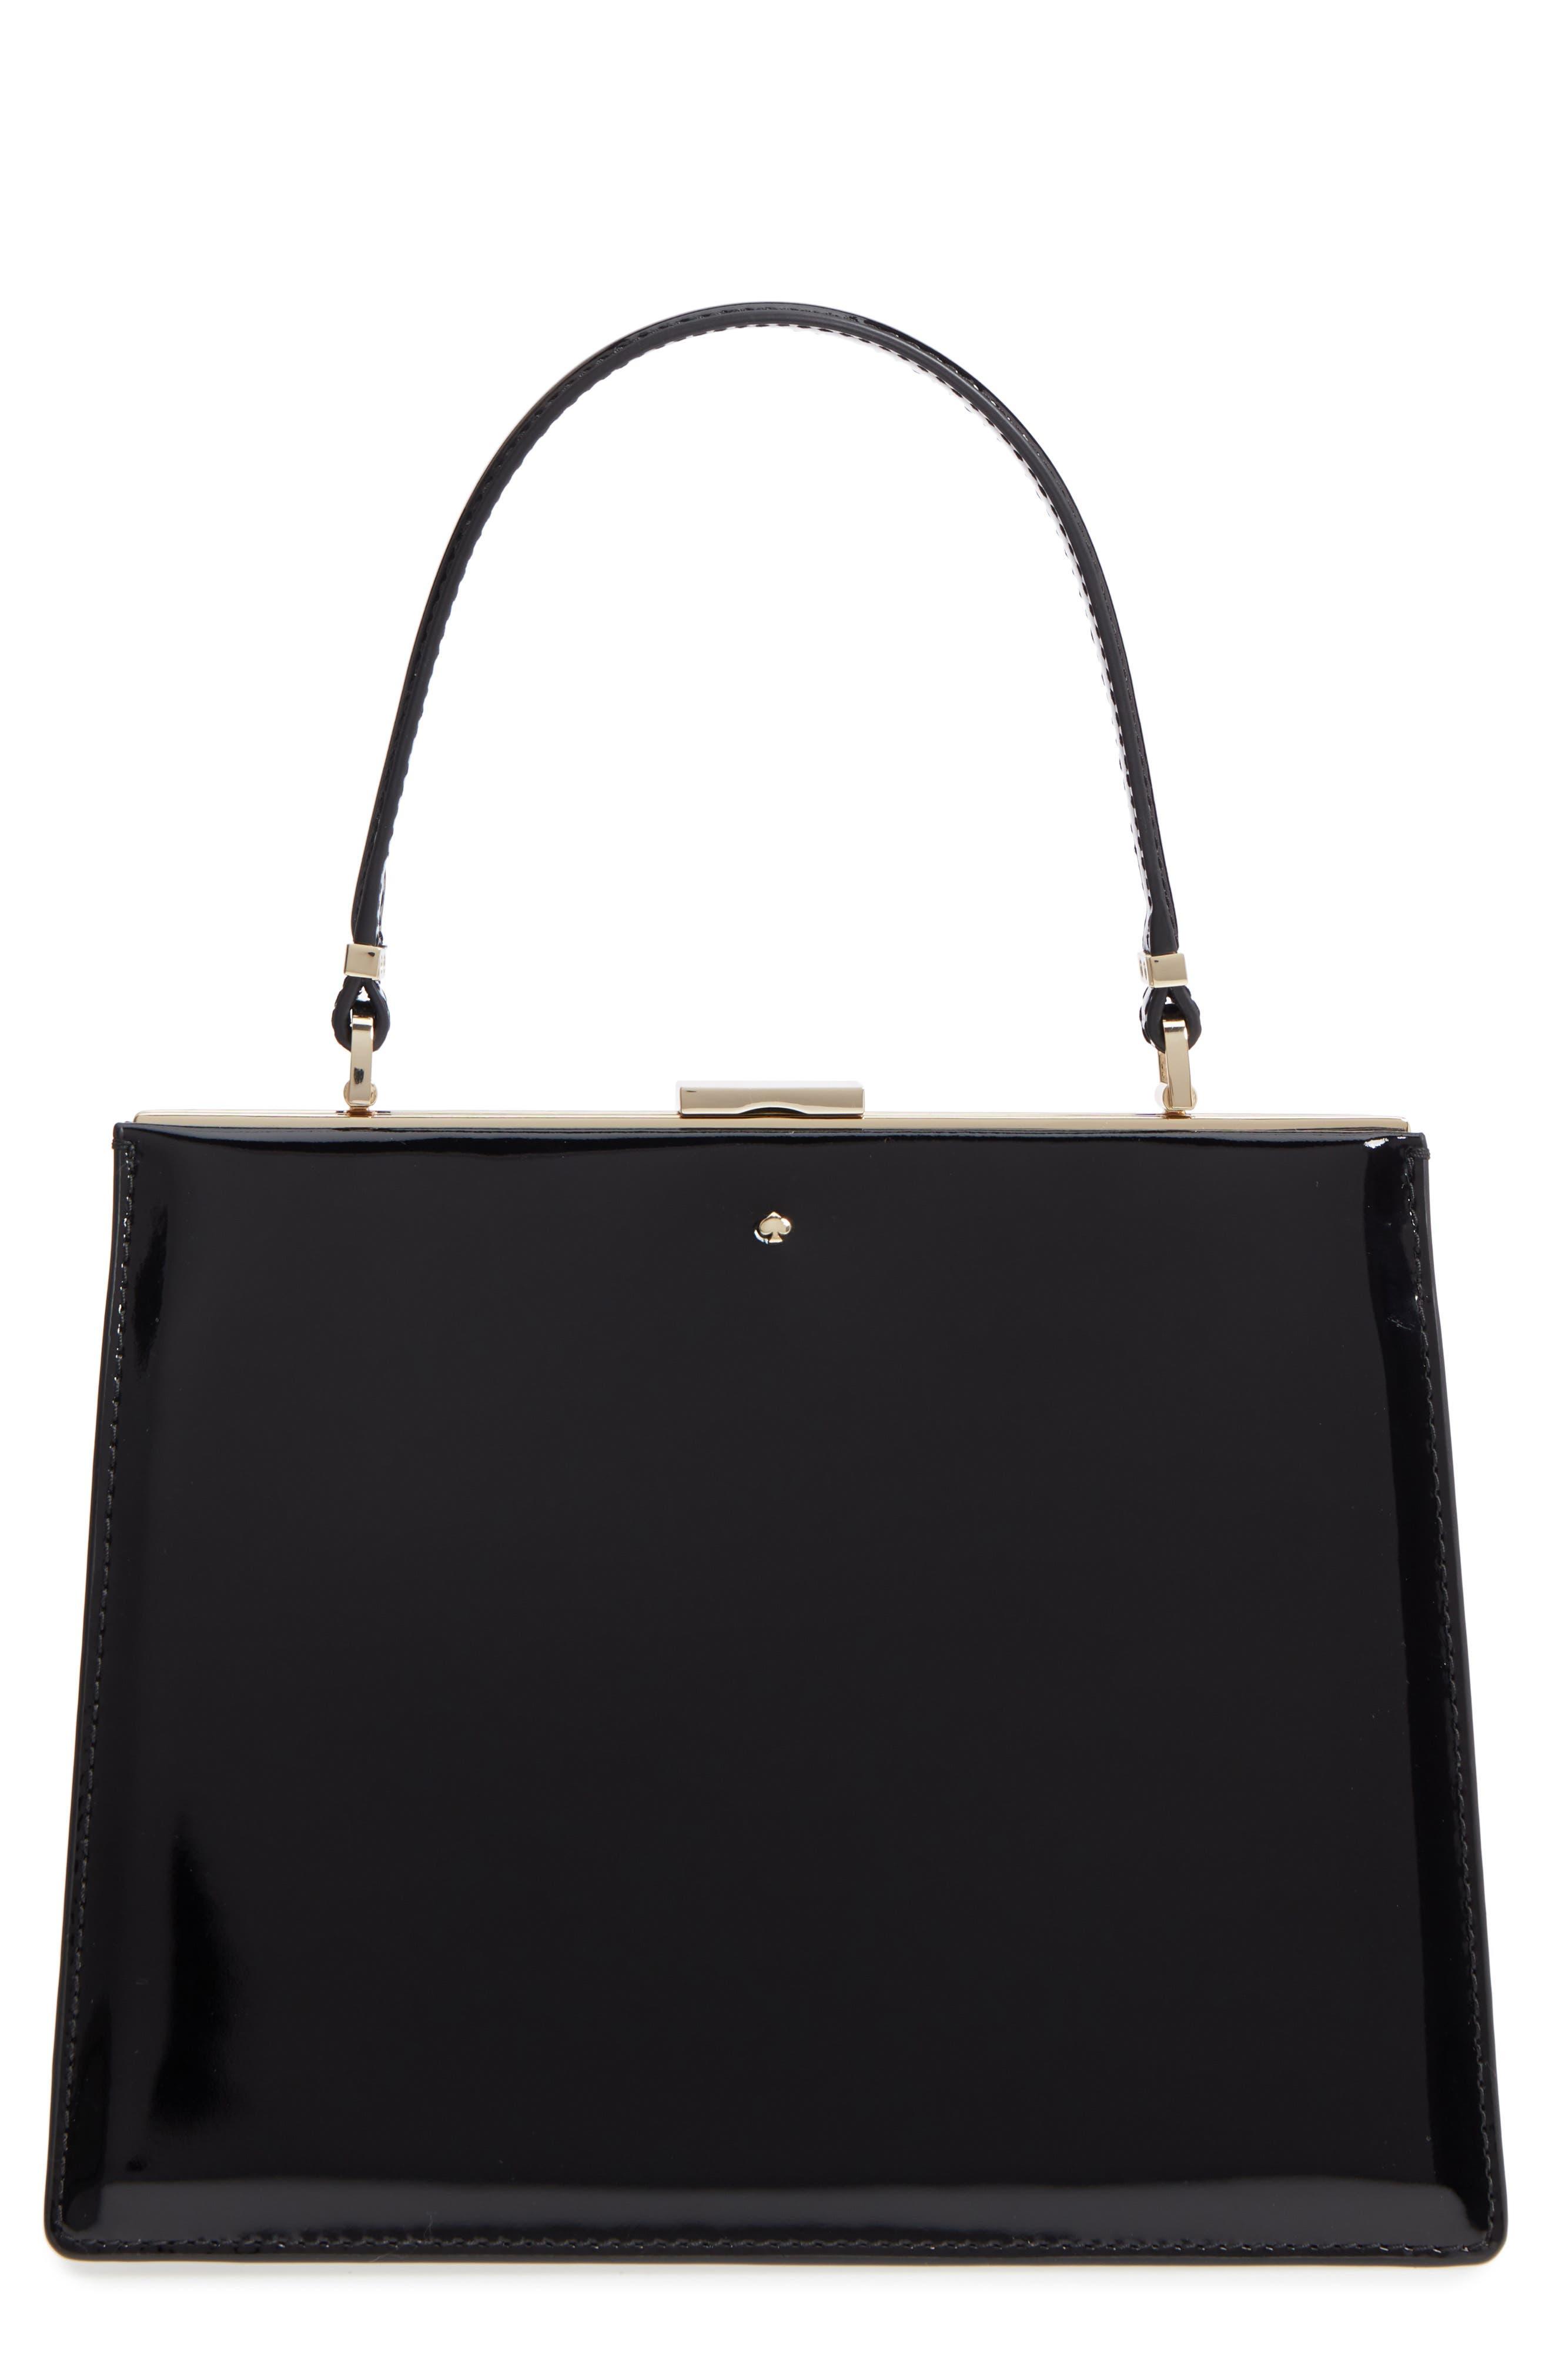 madison moore road - chari leather handbag,                         Main,                         color, 001